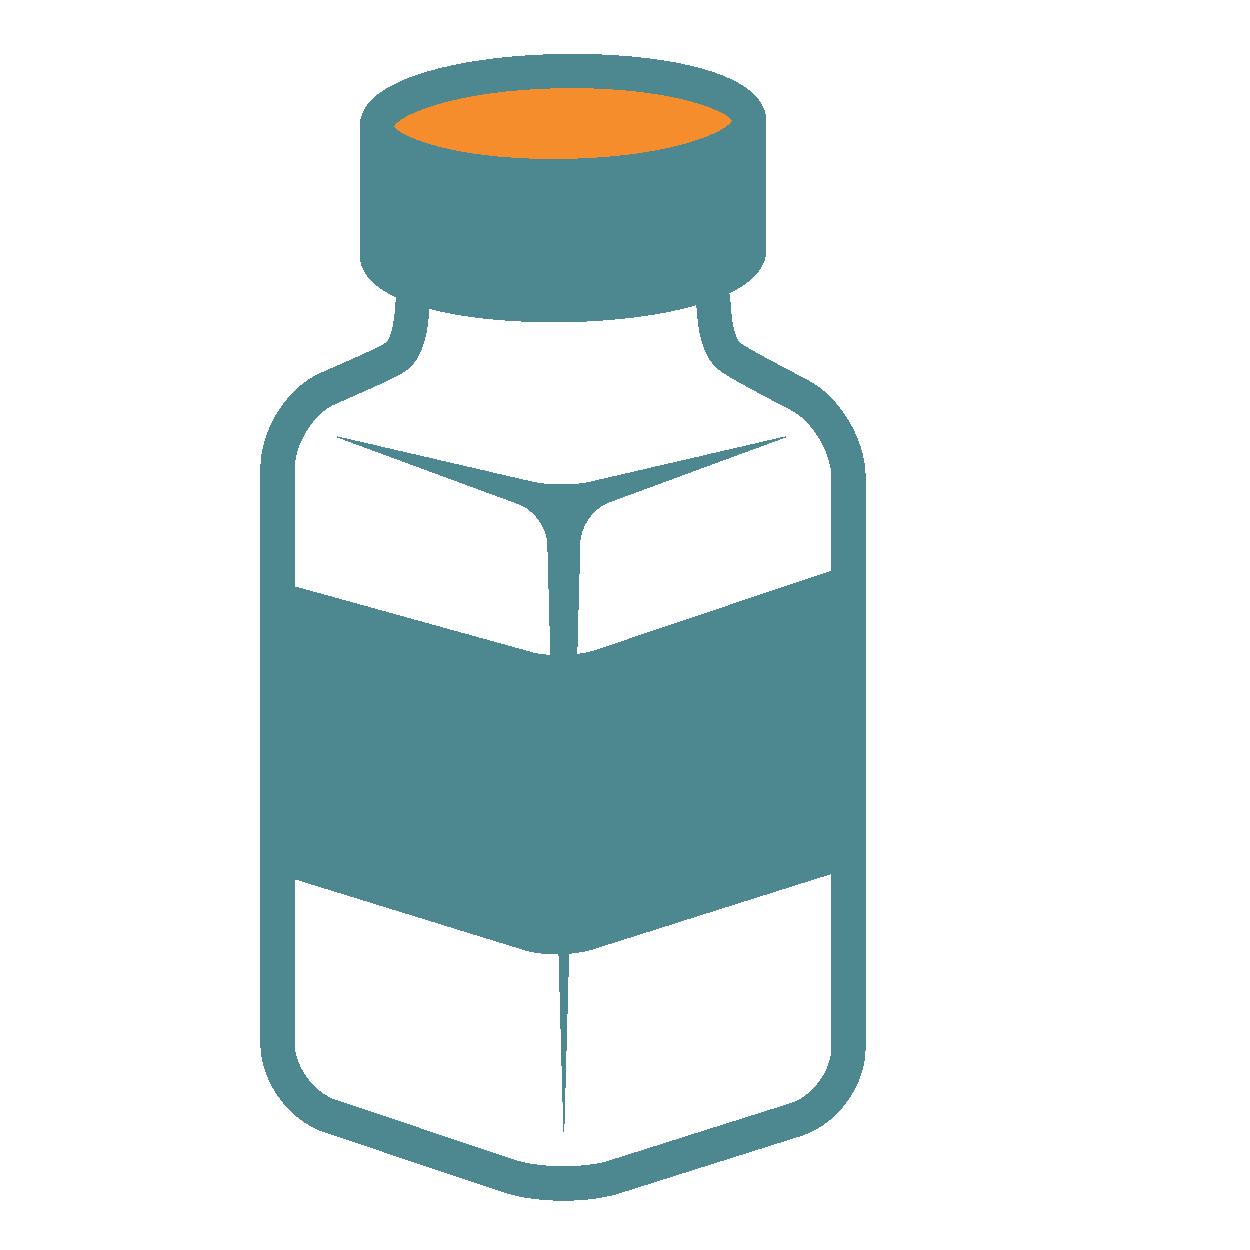 Medication clipart medicine cup. Ibuprofen loratadine health and